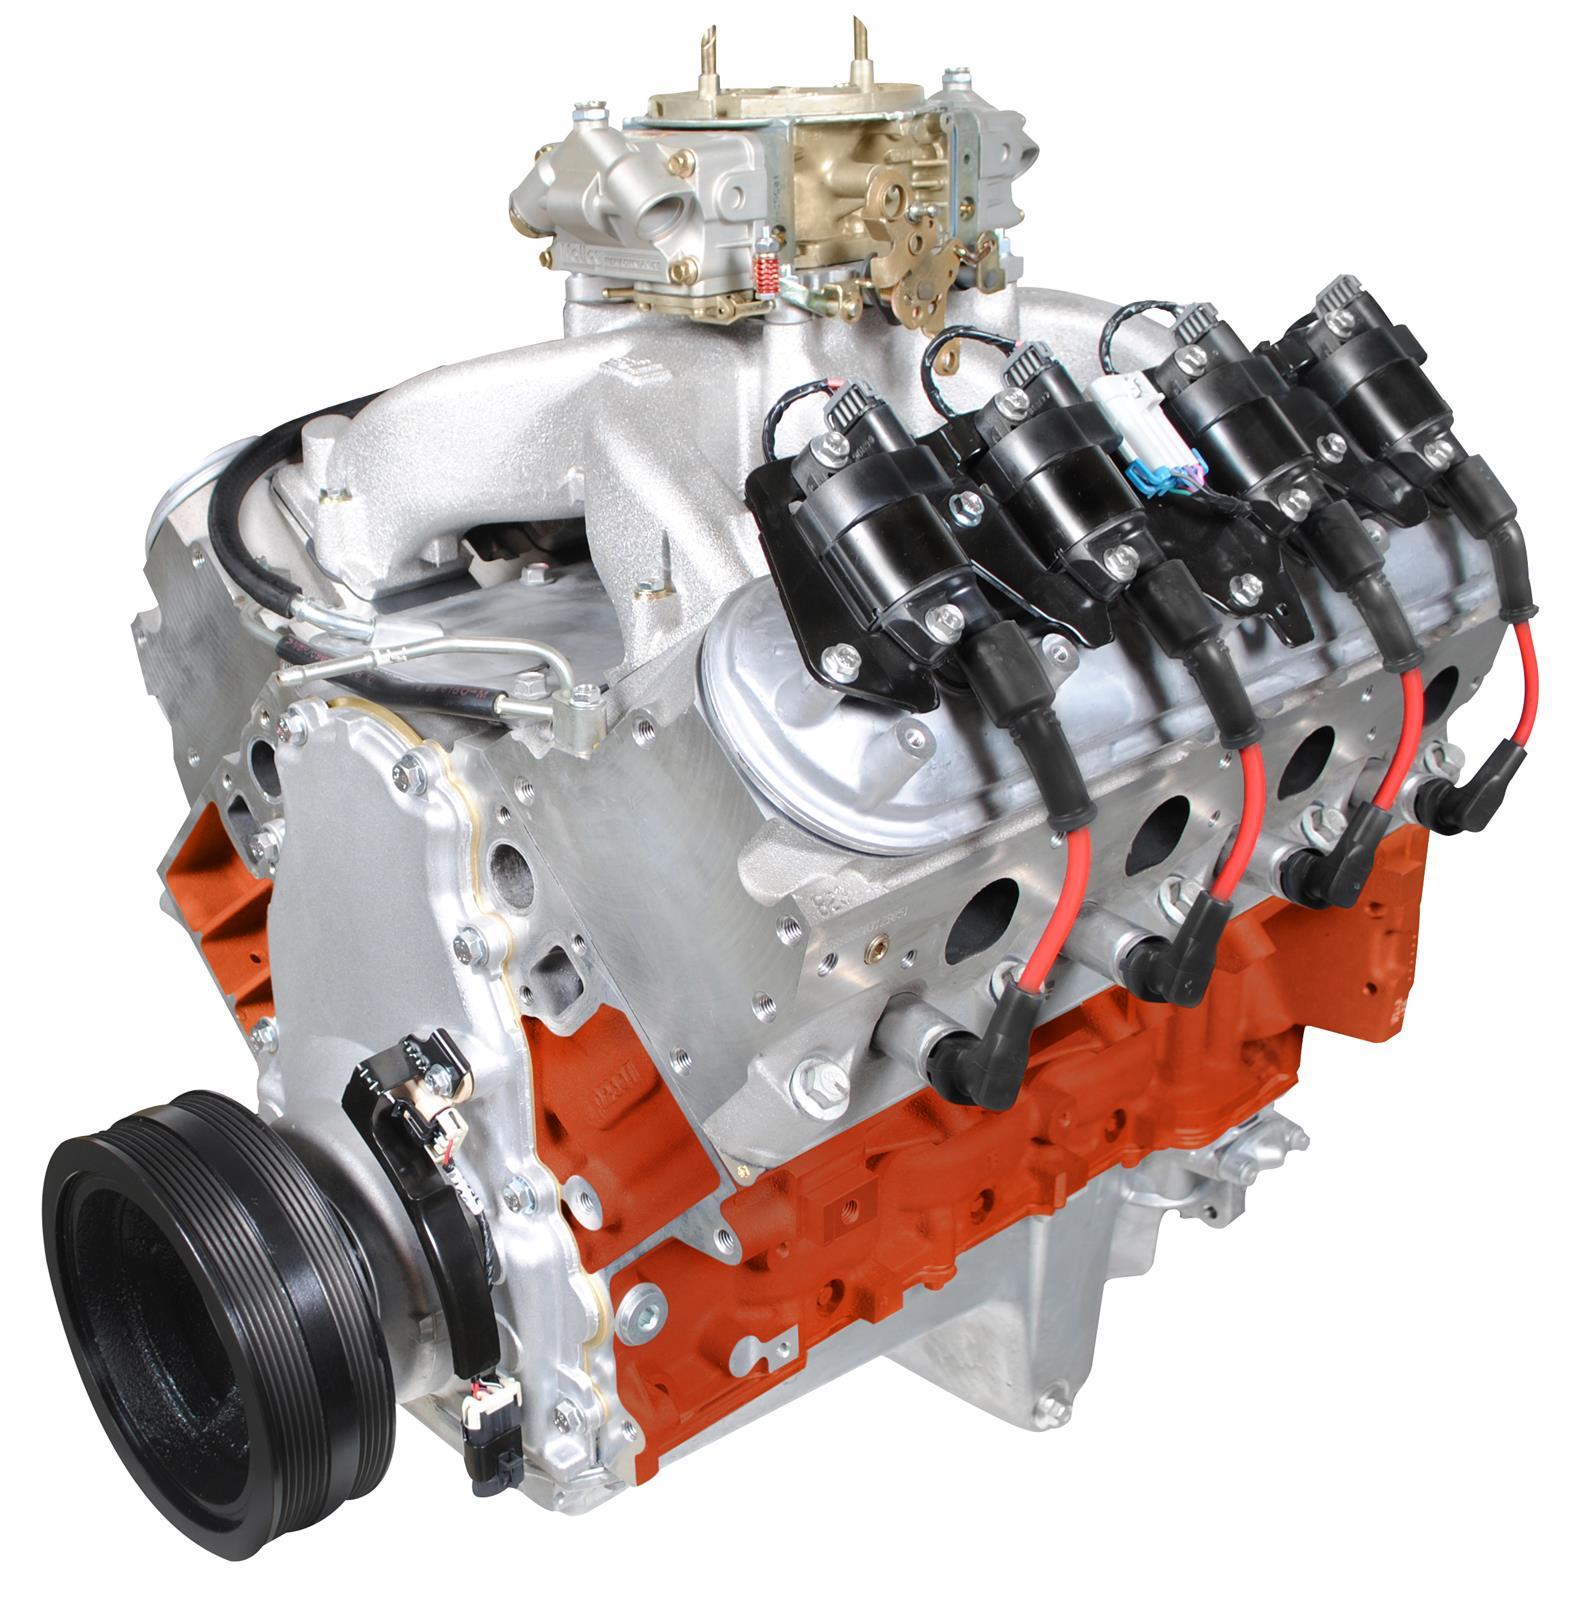 Harris Performance Engines